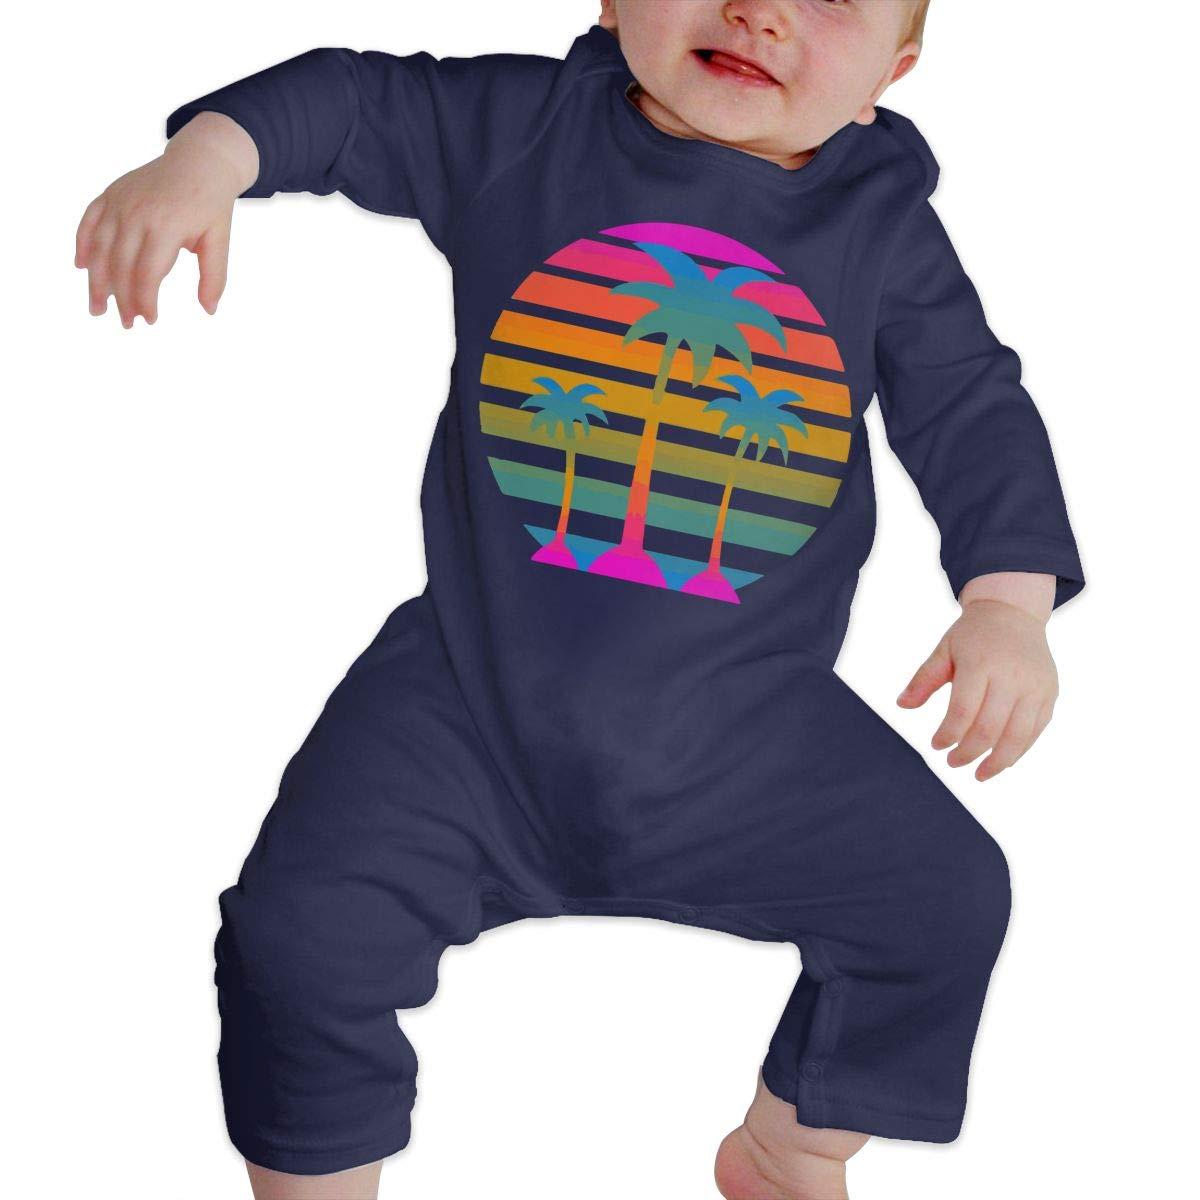 Mri-le1 Toddler Baby Boy Girl Jumpsuit Palm Tree Sunset Toddler Jumpsuit